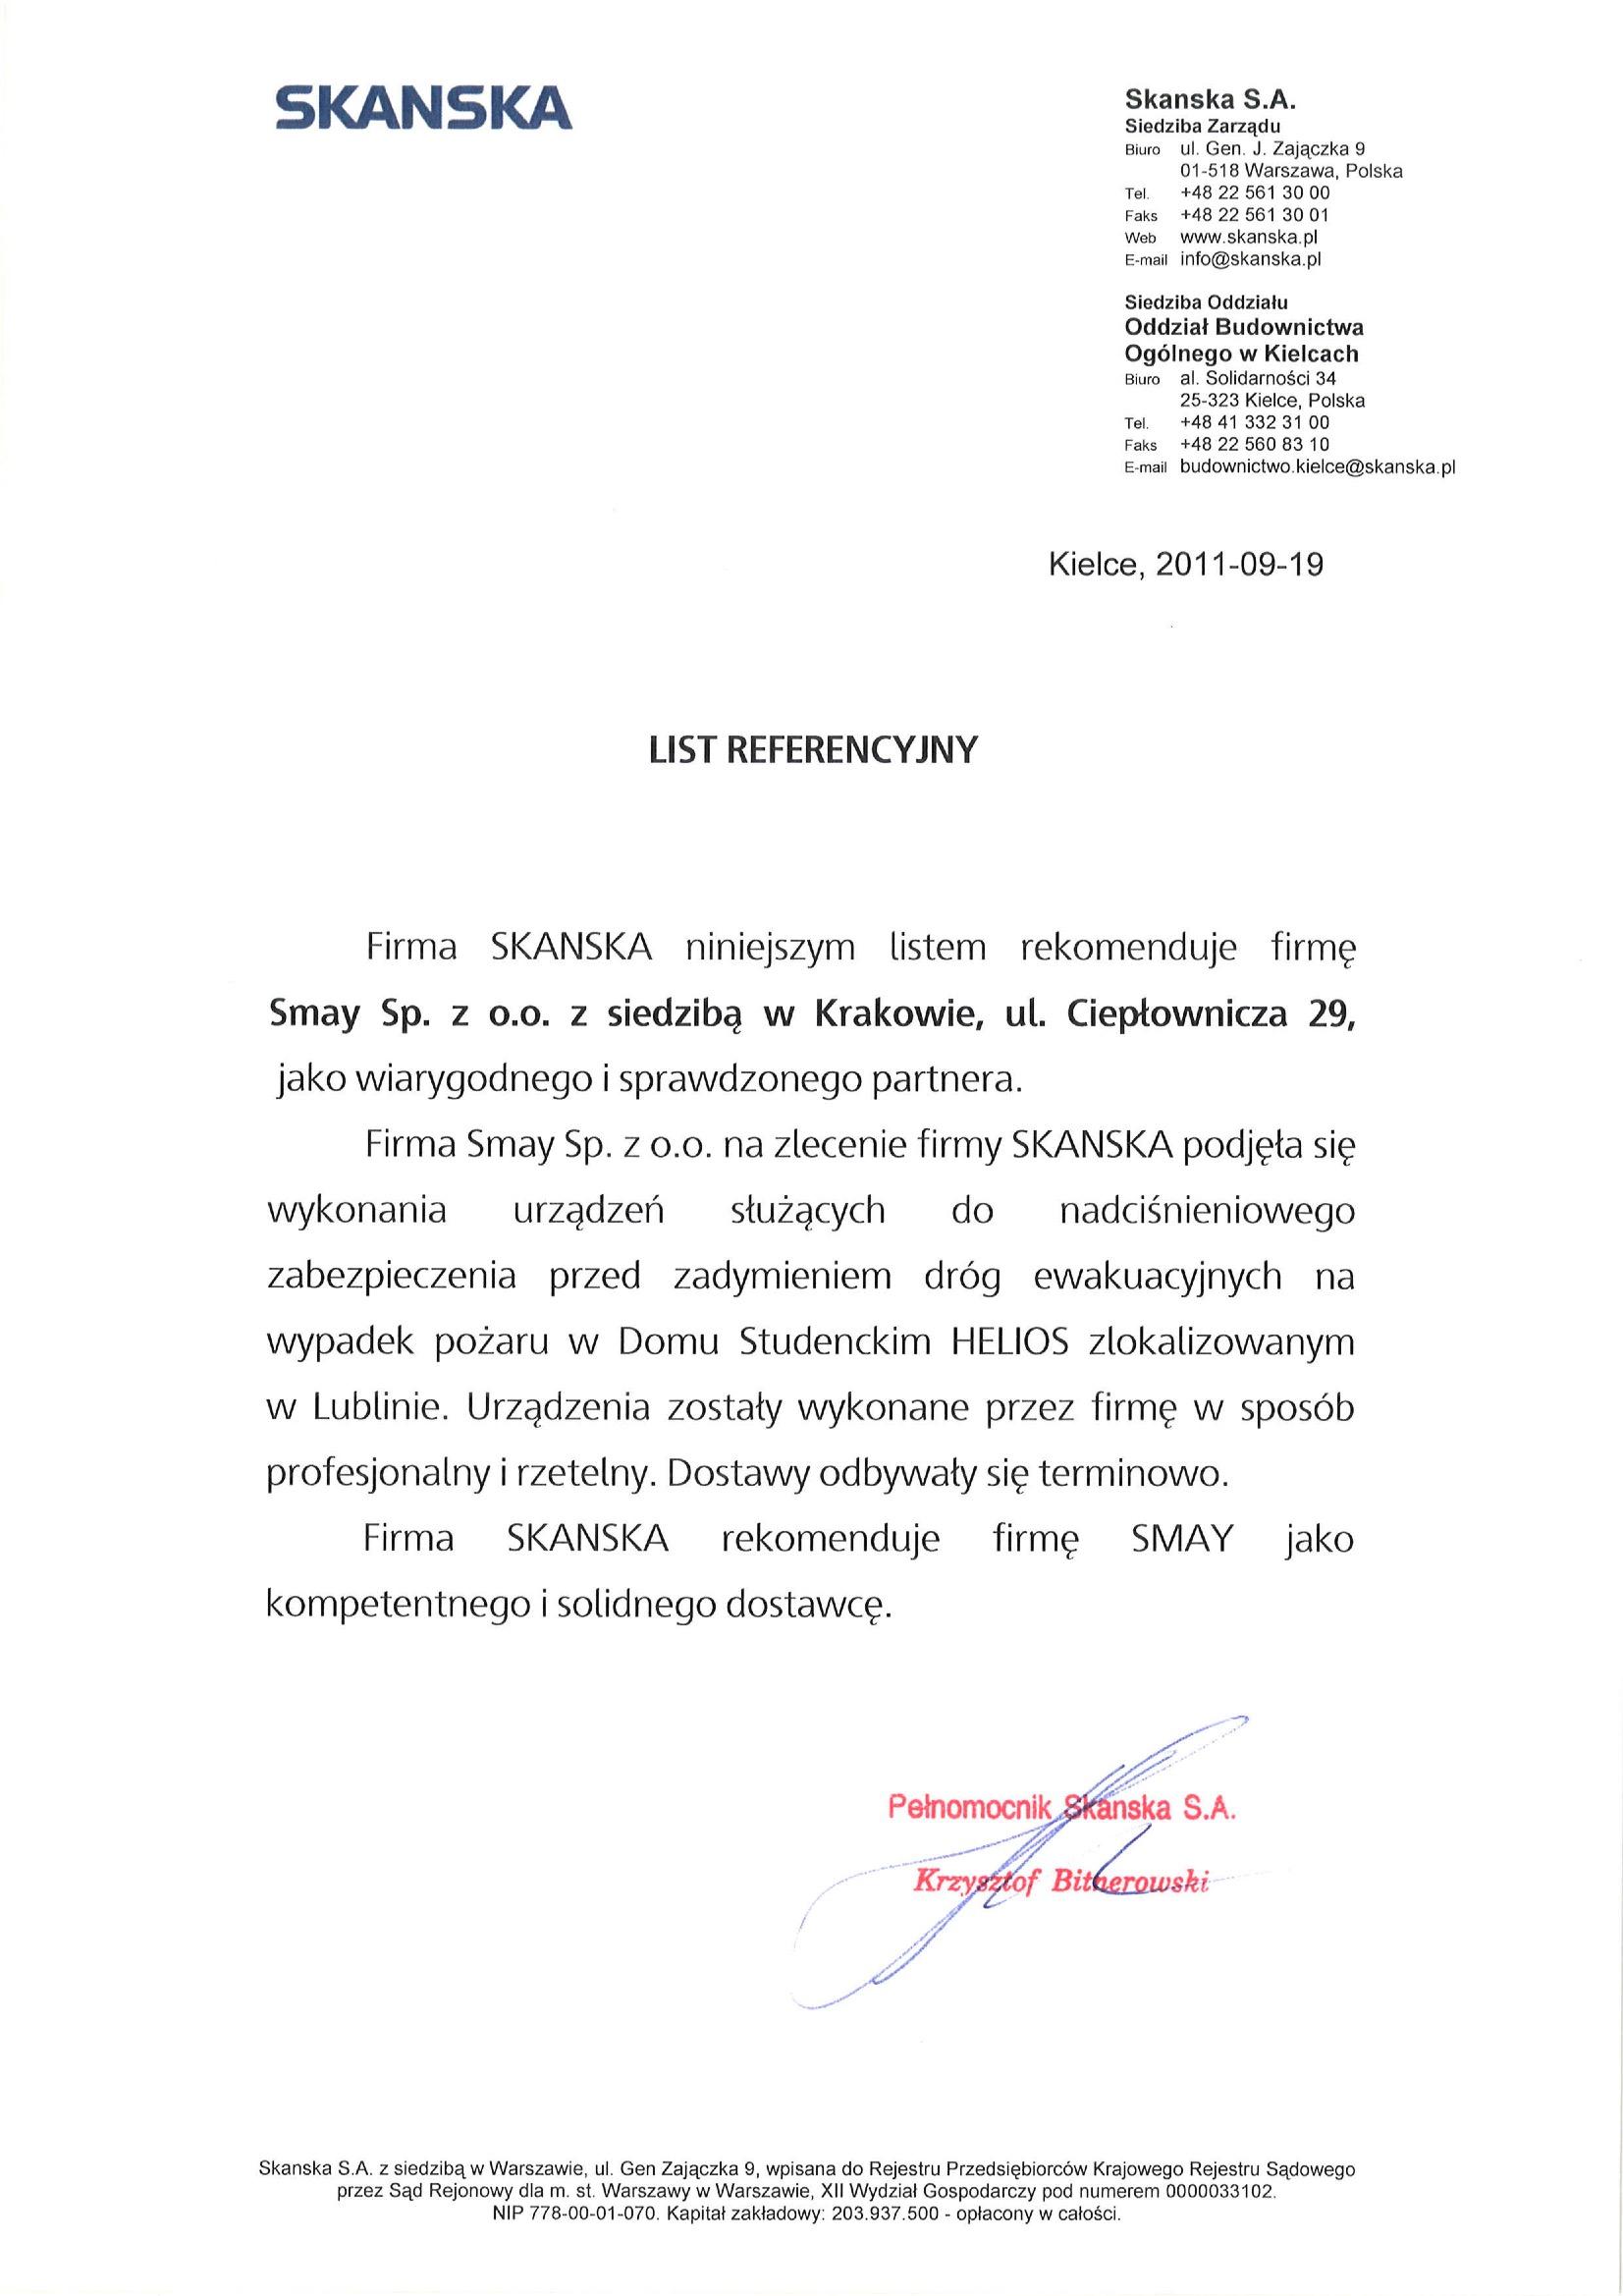 Reference - SKANSKA